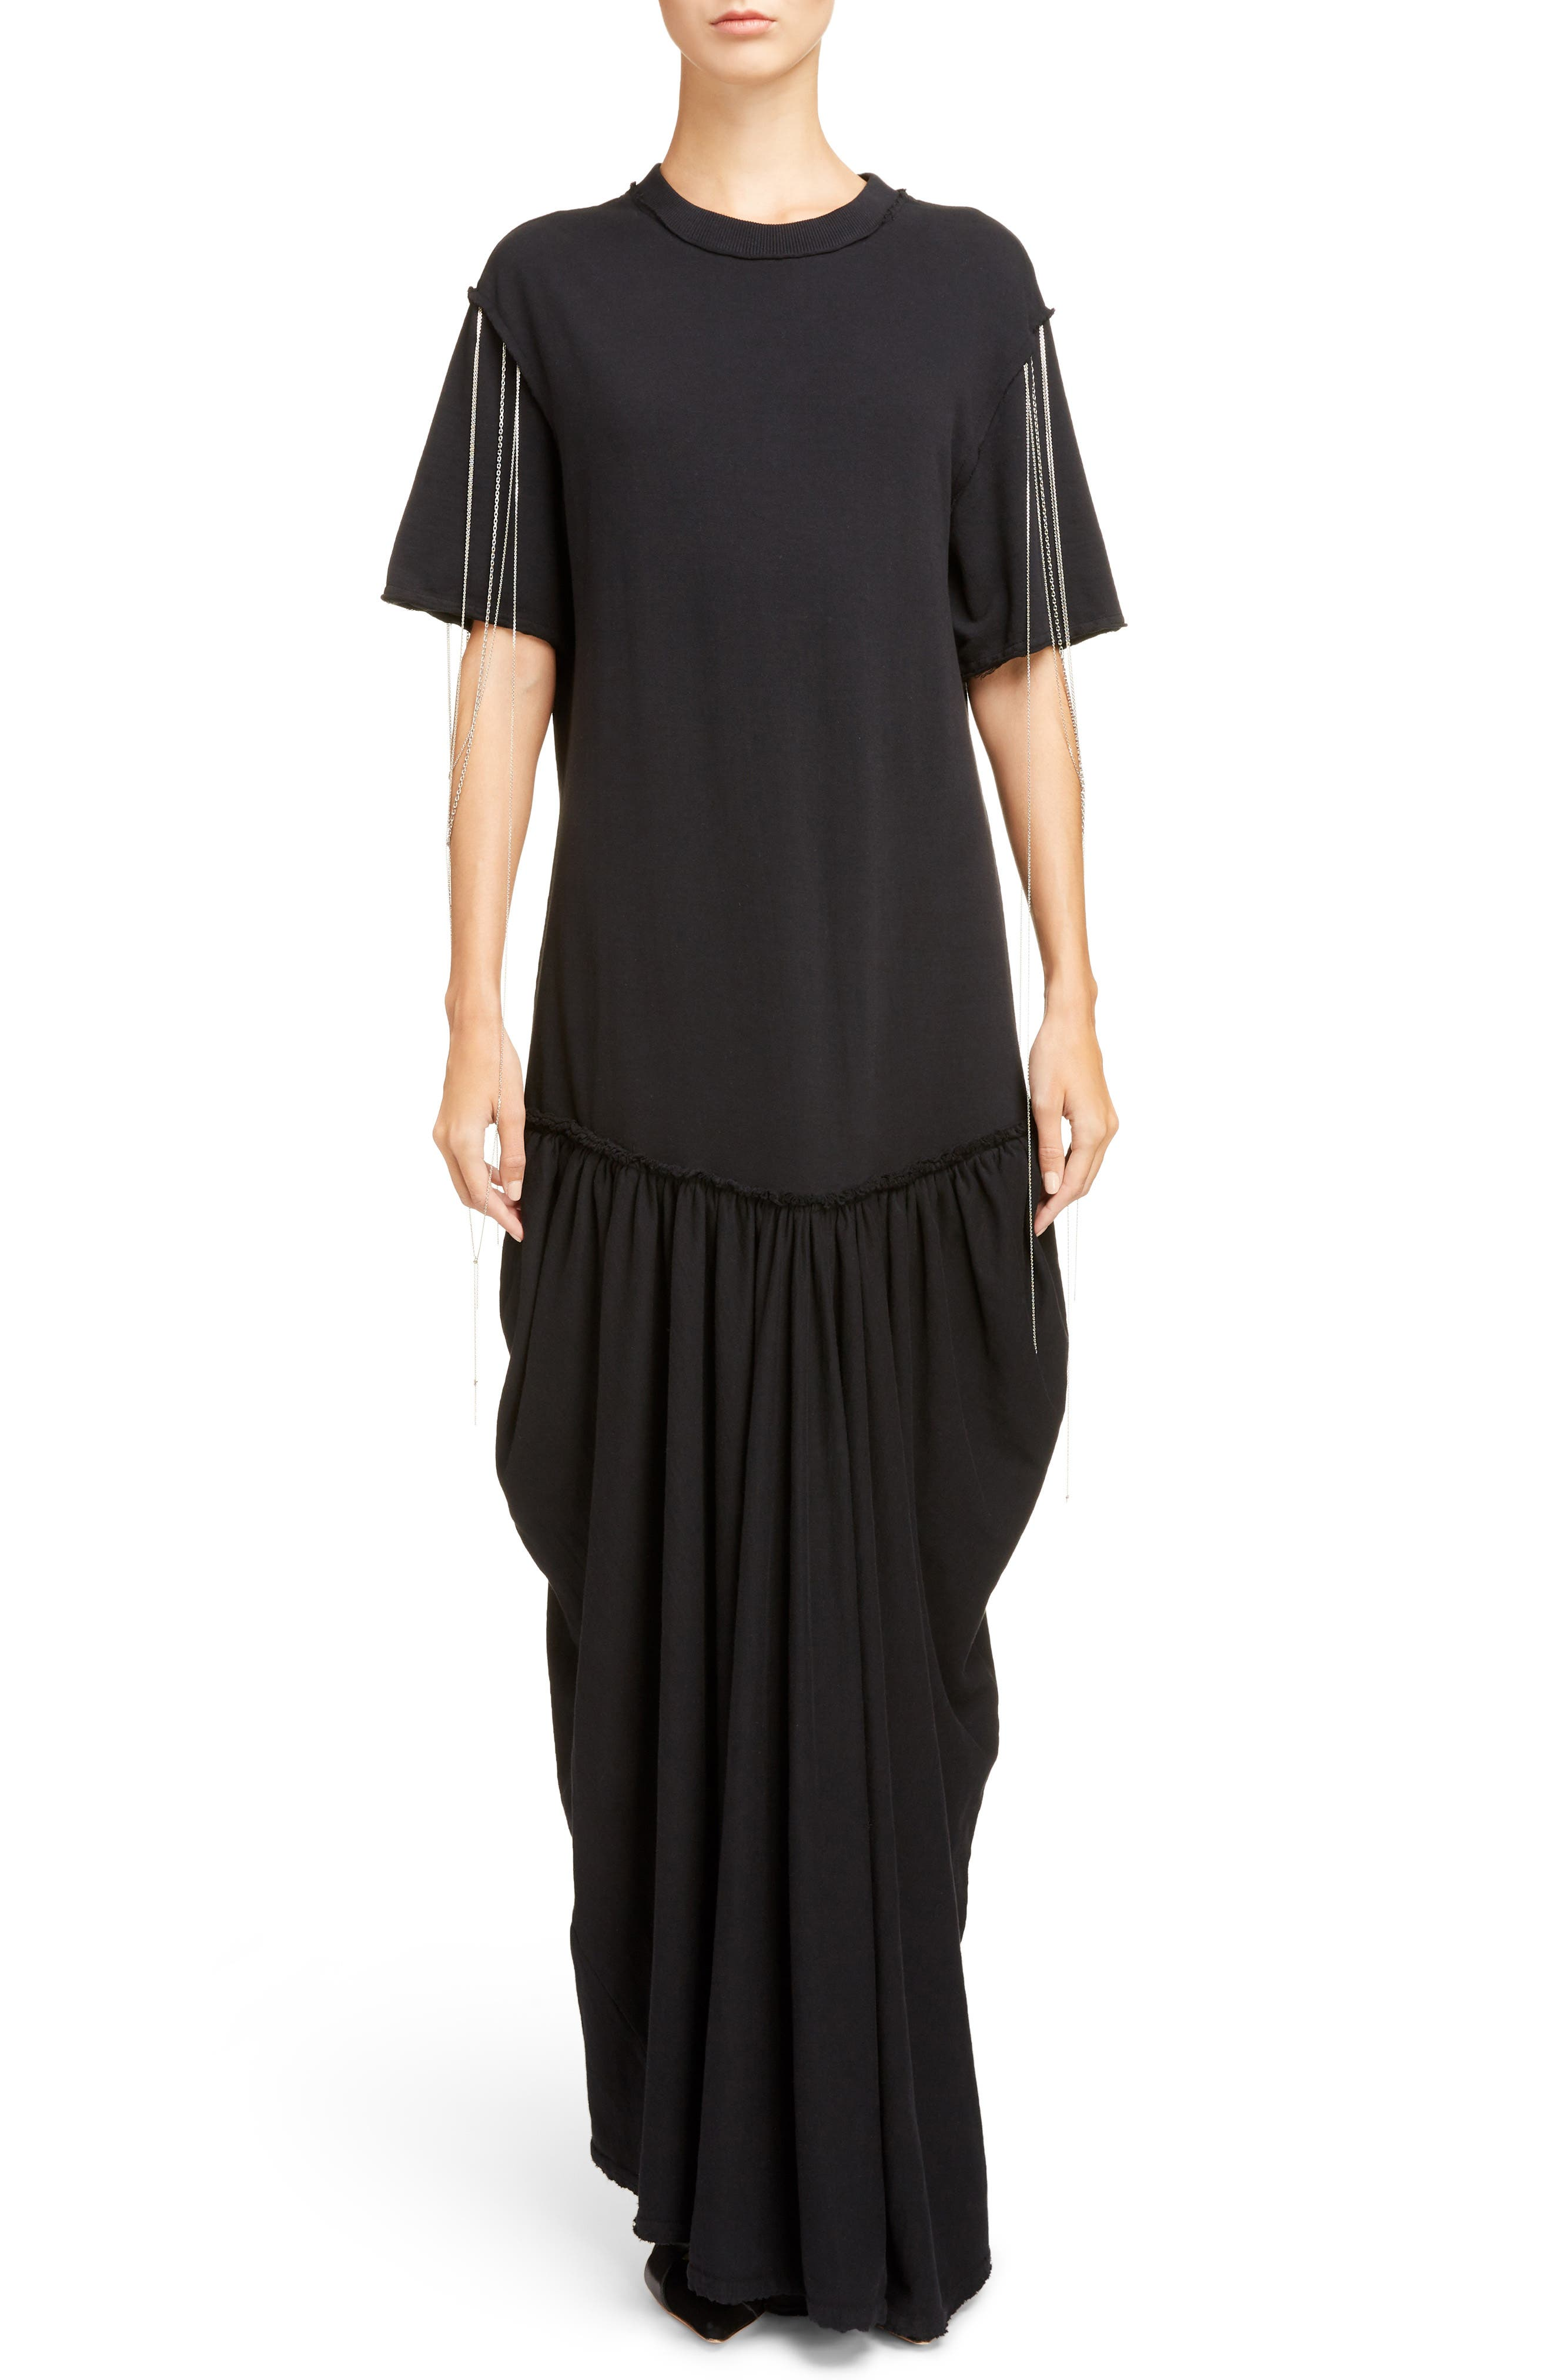 J.W.ANDERSON Chain Trim Jersey Maxi Dress